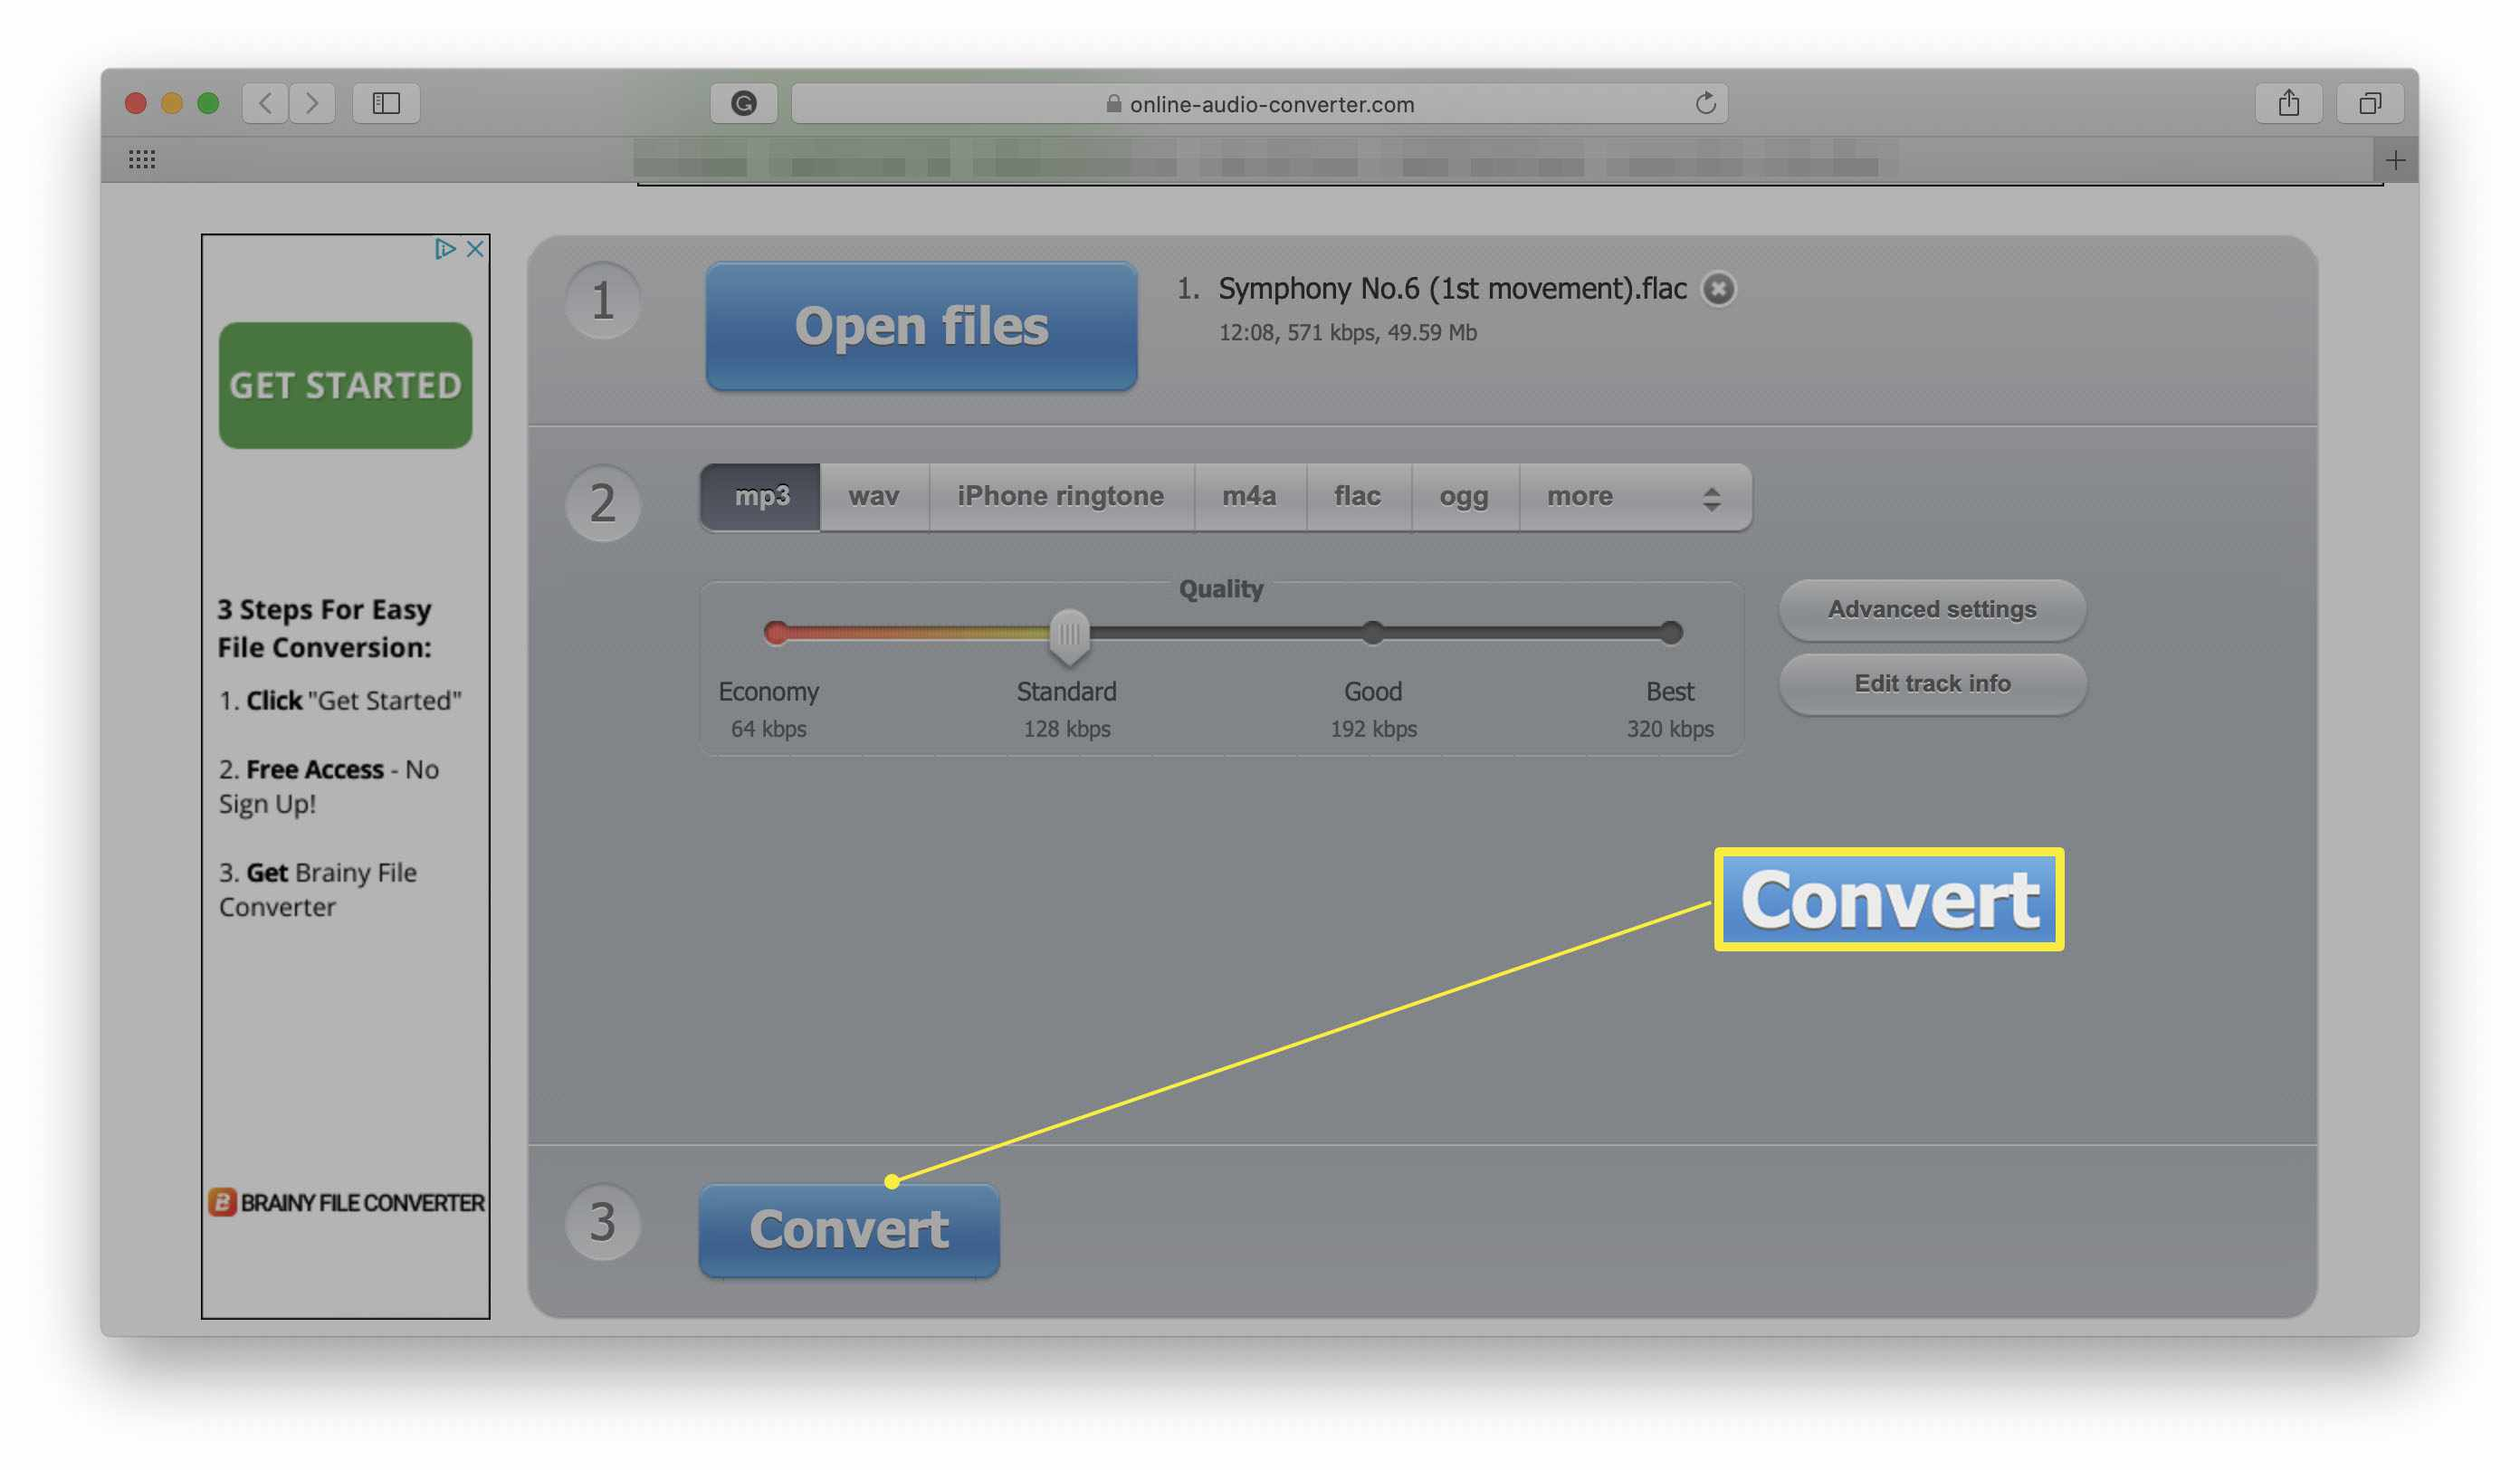 Online Audio Converter website with Convert button highlighted